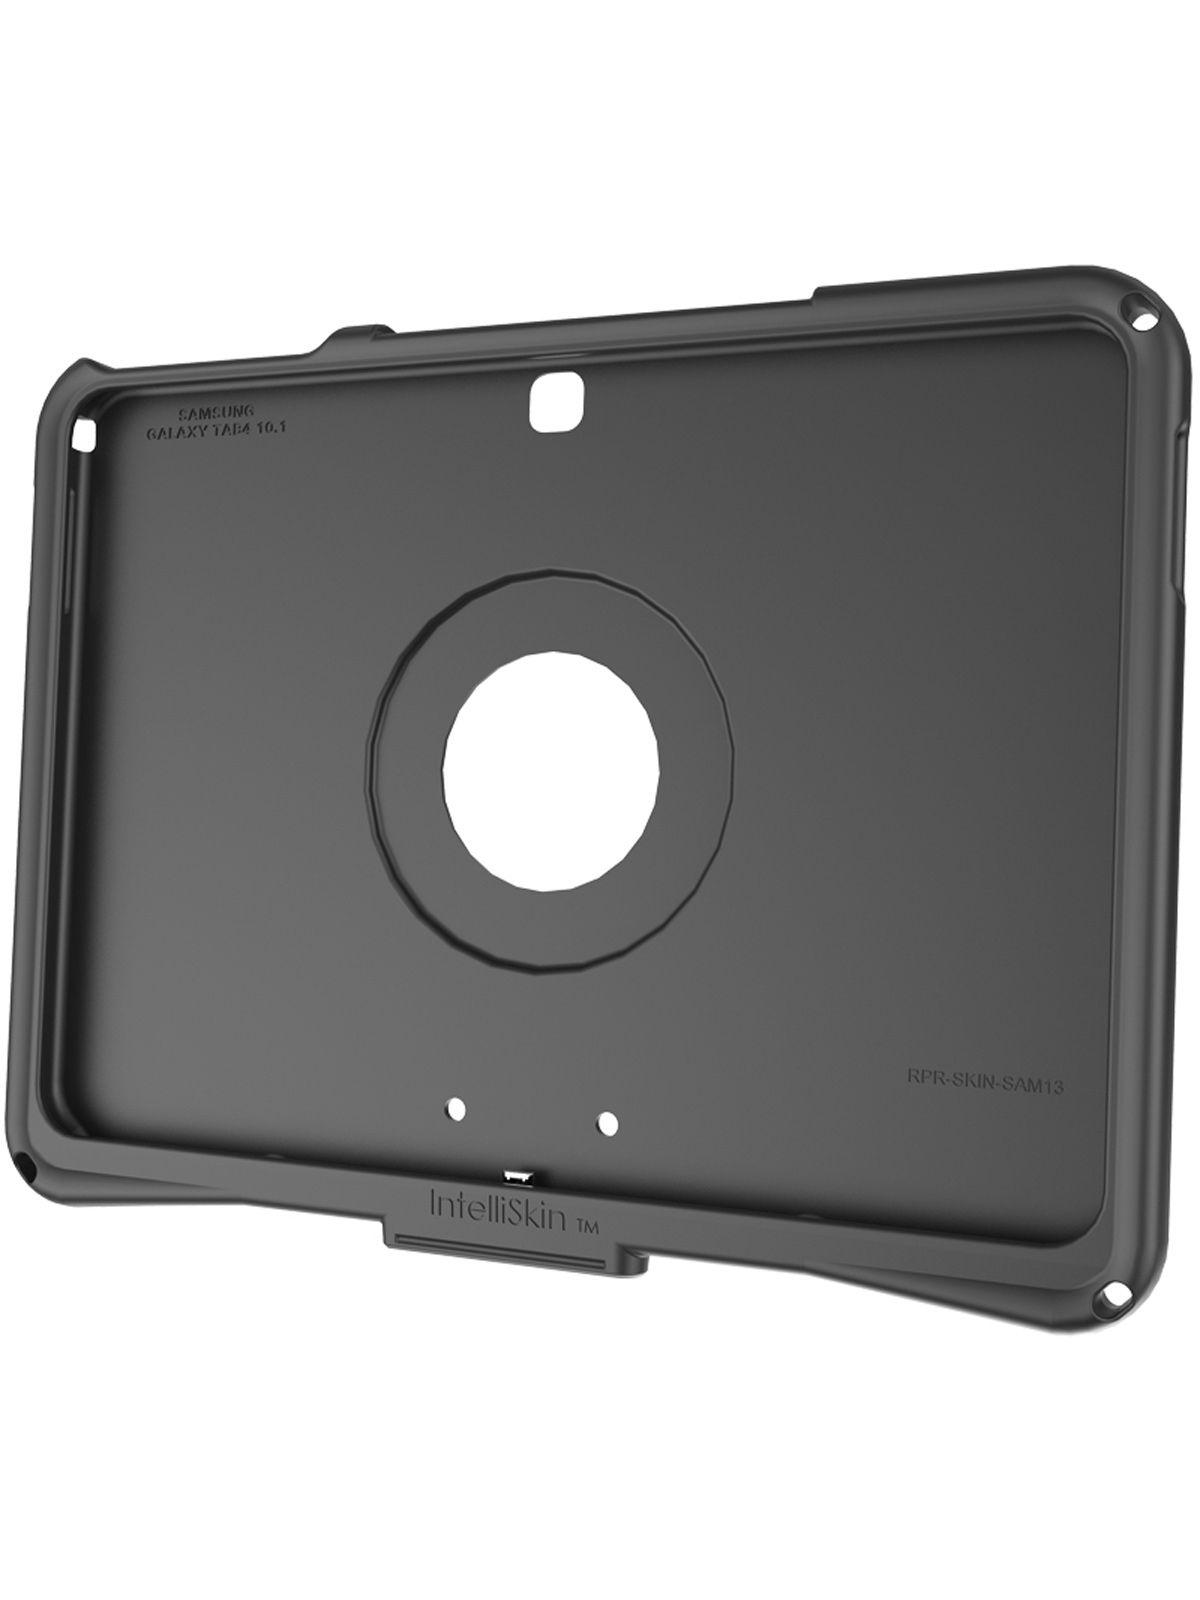 RAM Mounts IntelliSkin Lade-/Schutzhülle Samsung Galaxy Tab 4 10.1 - GDS-Technologie